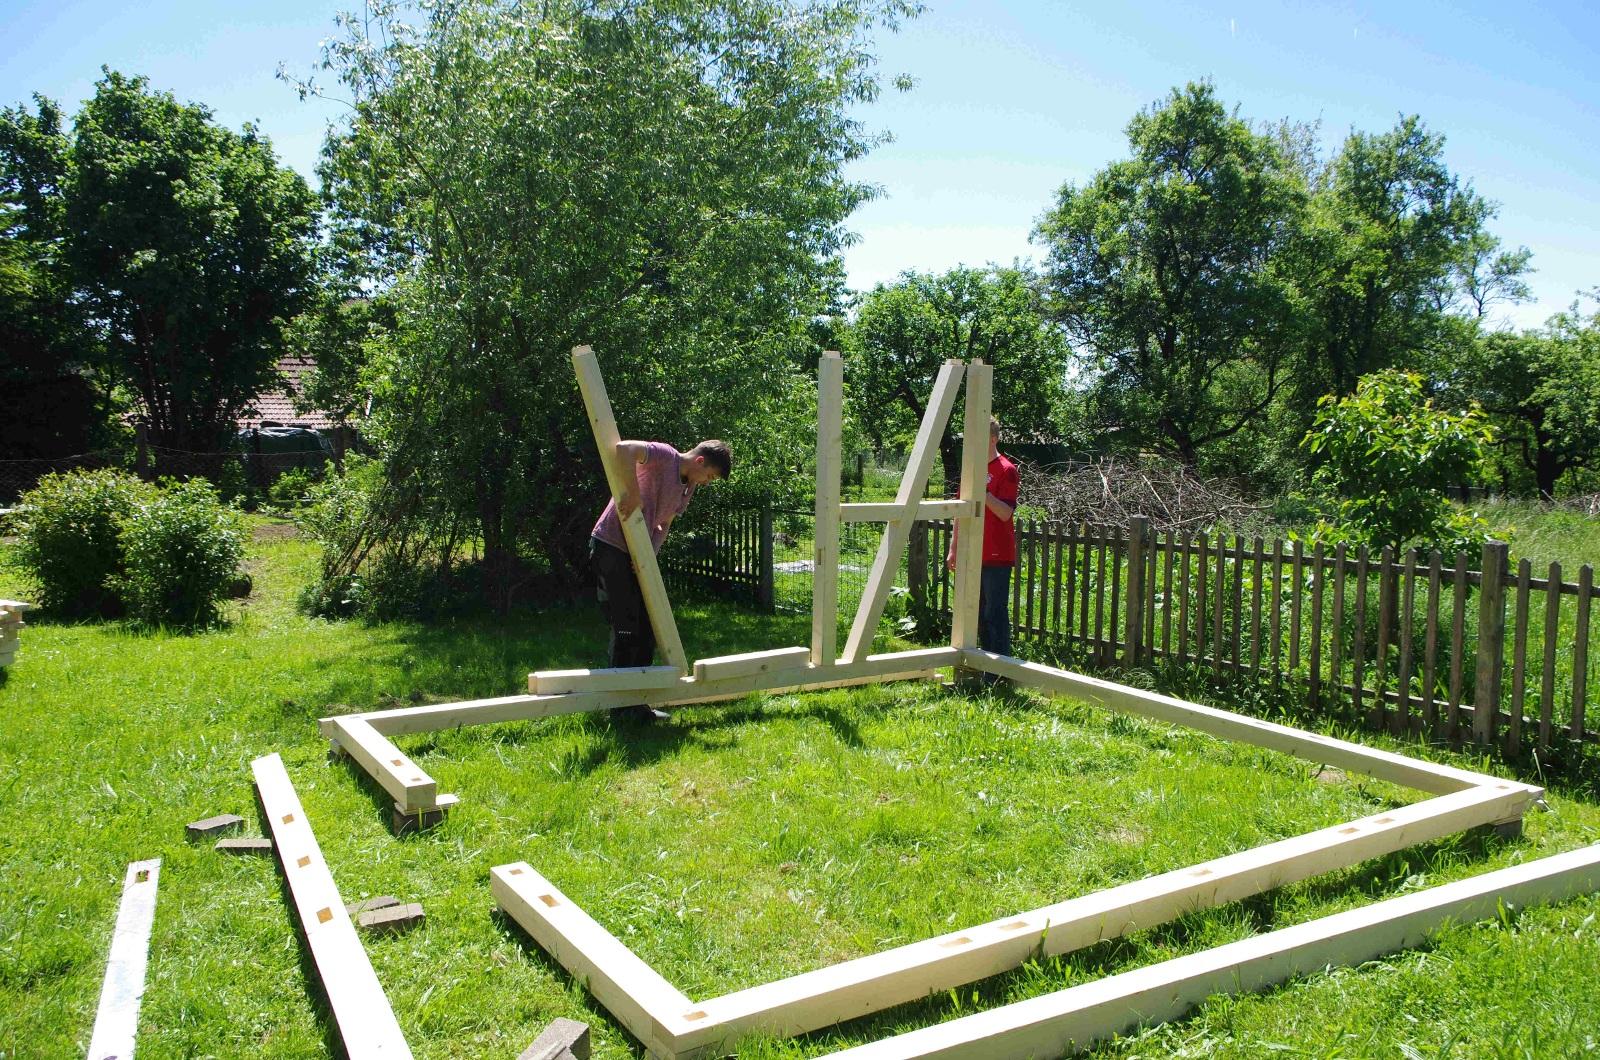 Berühmt Gartenhaus ohne Bauantrag! - Zimmerei Hombach FY35